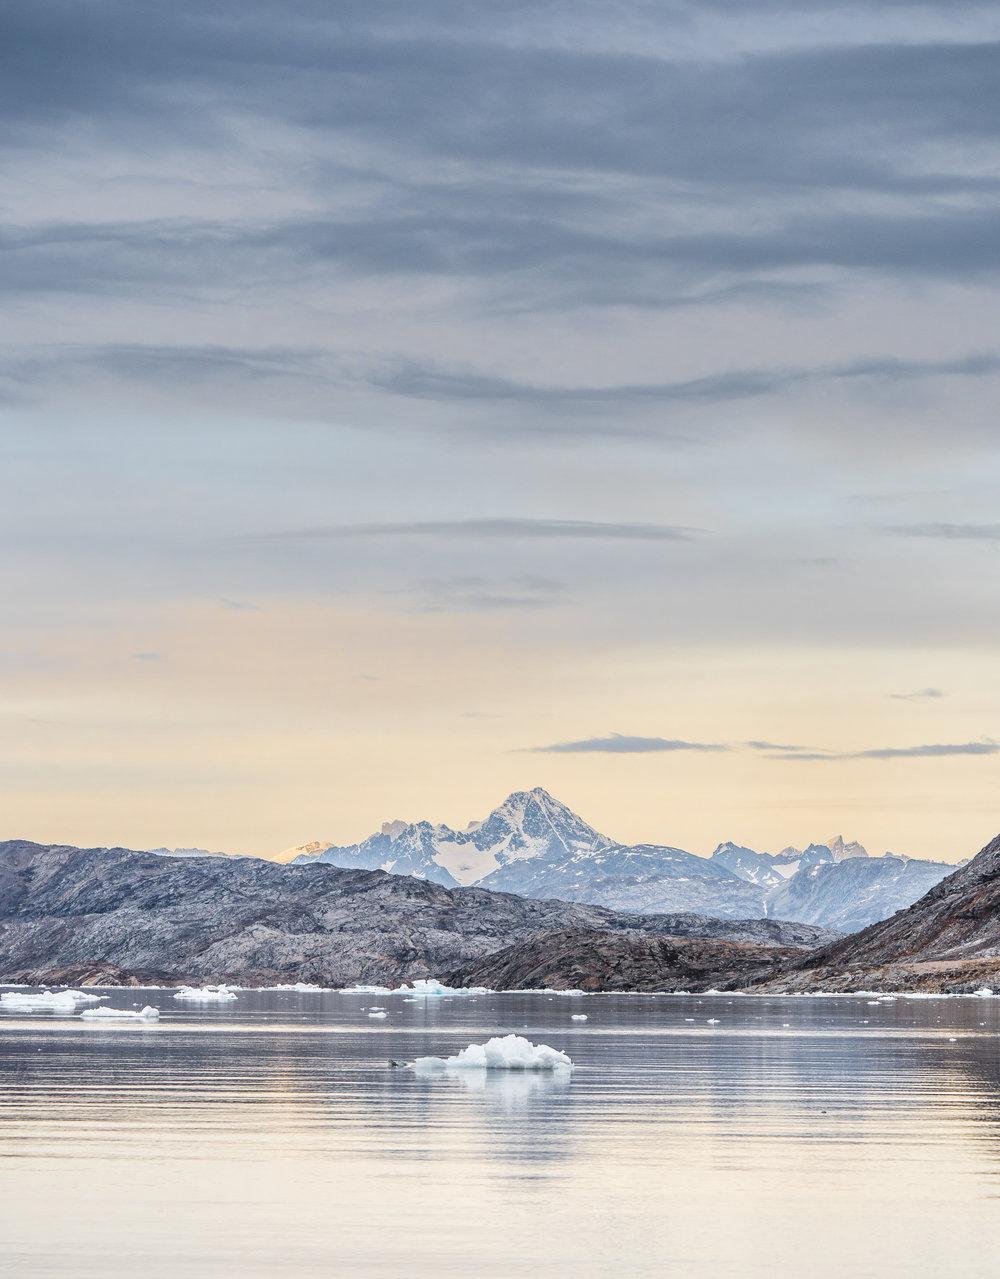 greenland ice 2.jpg